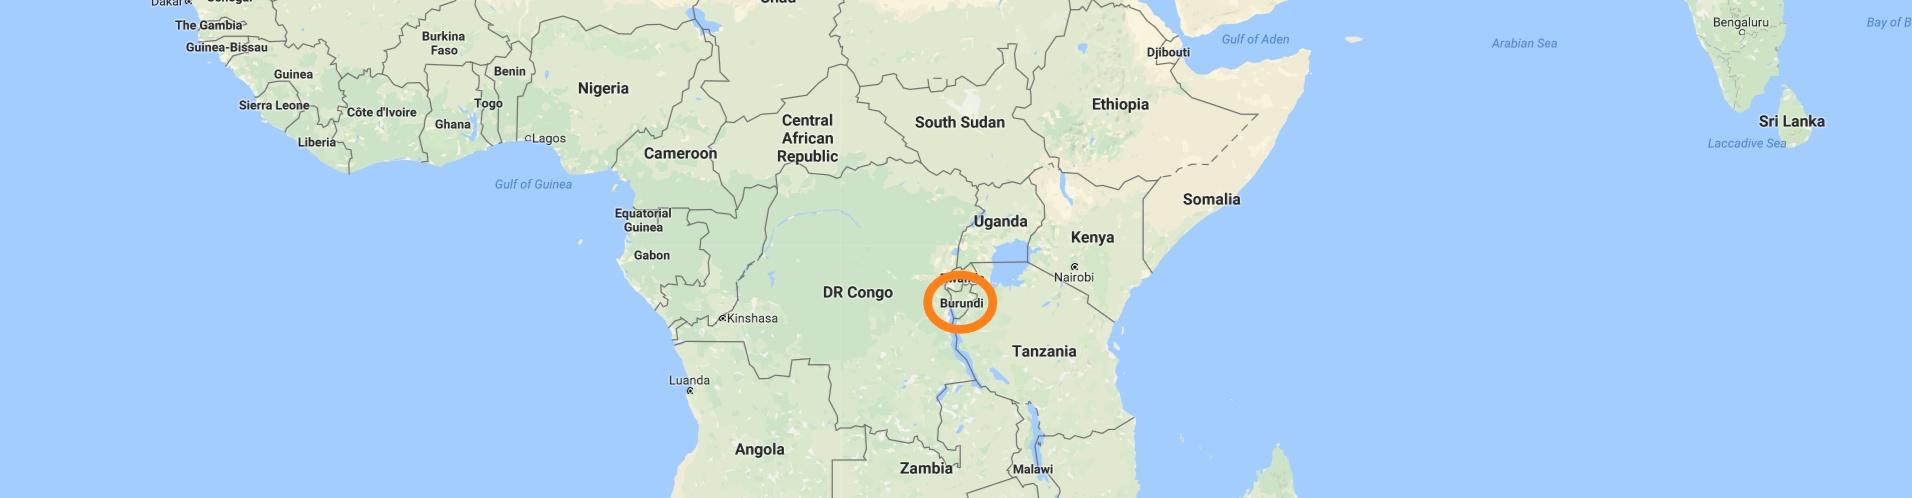 A map with Burundi circled